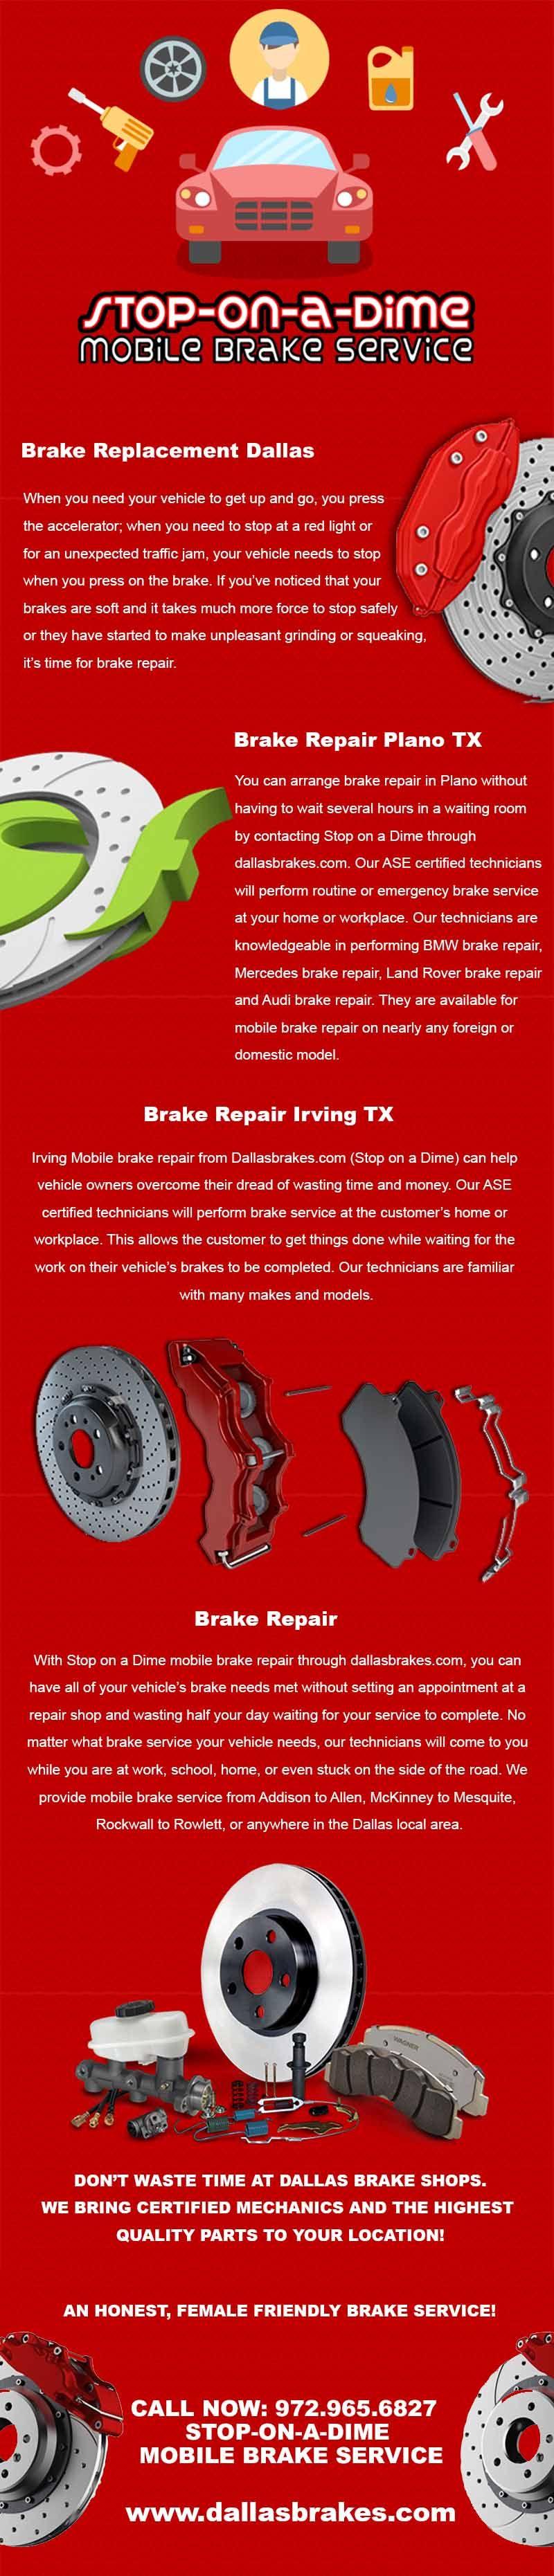 Best 25 brake service ideas on pinterest brake service cost best 25 brake service ideas on pinterest brake service cost car brake system and auto repair near me 1betcityfo Image collections